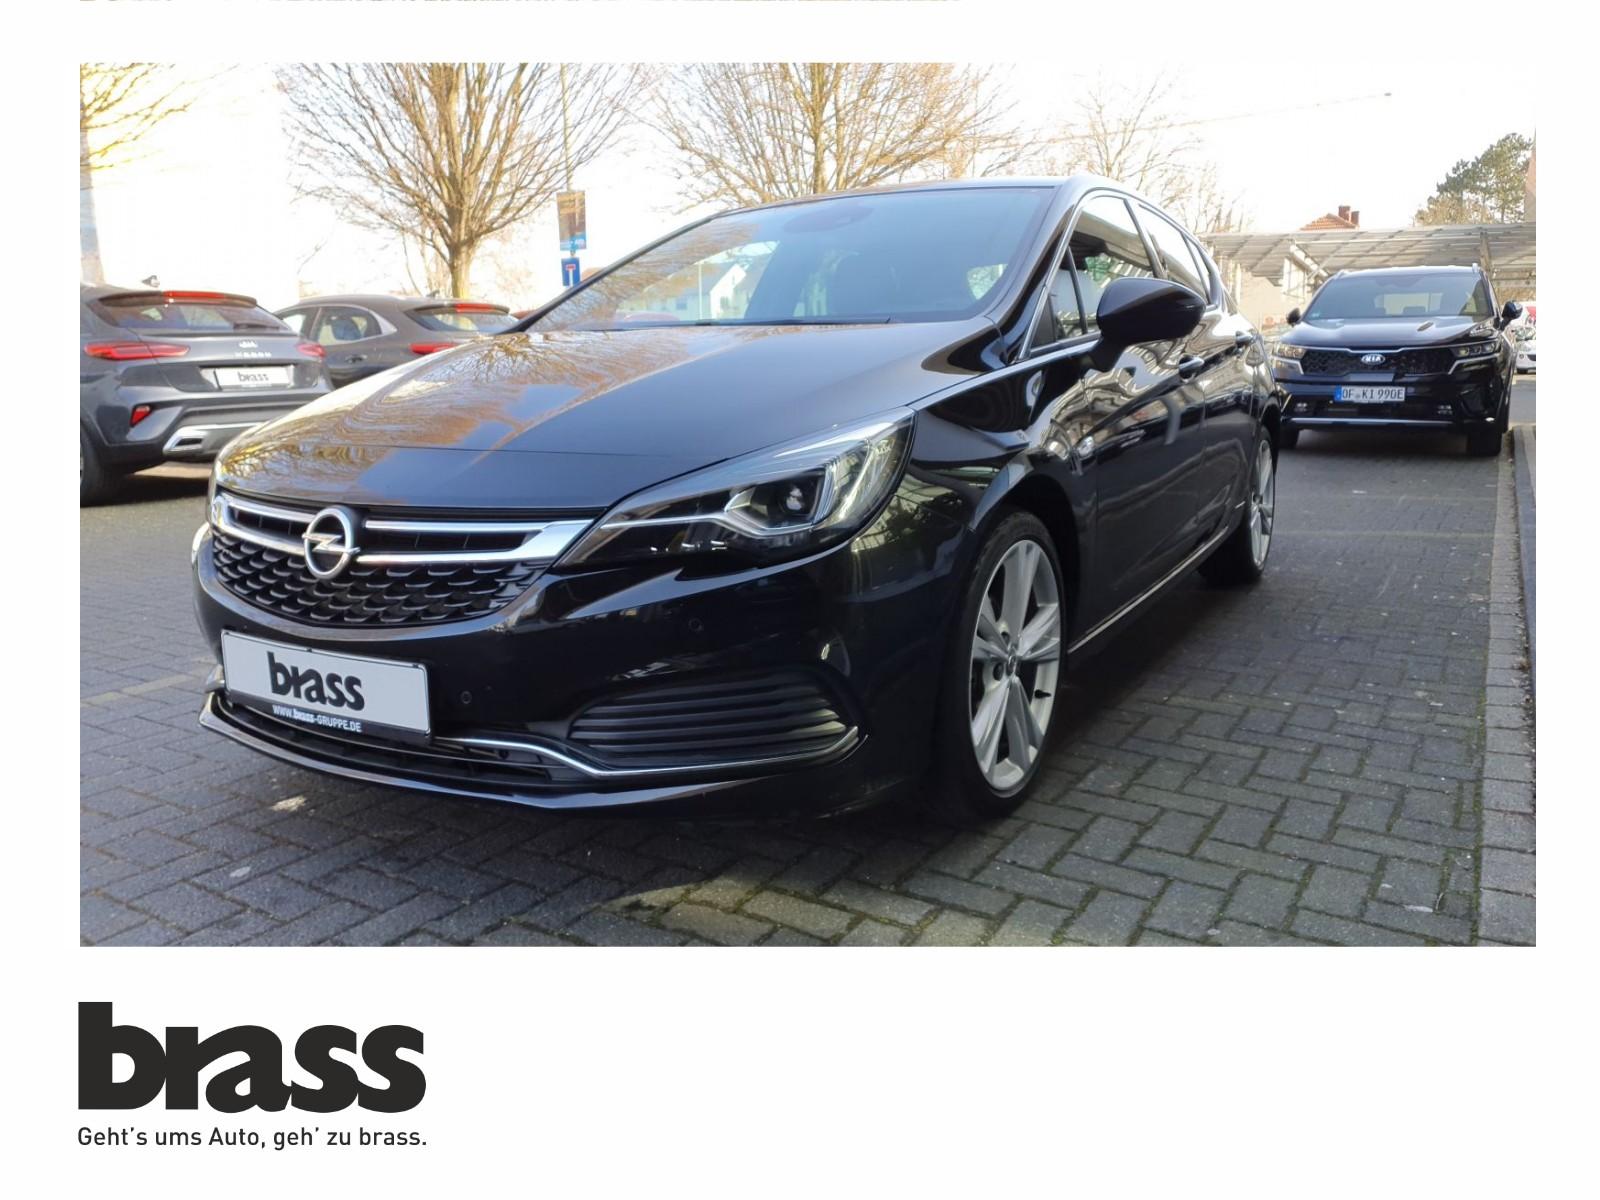 Opel Astra K 1.4 Turbo Dynamic, Jahr 2017, Benzin